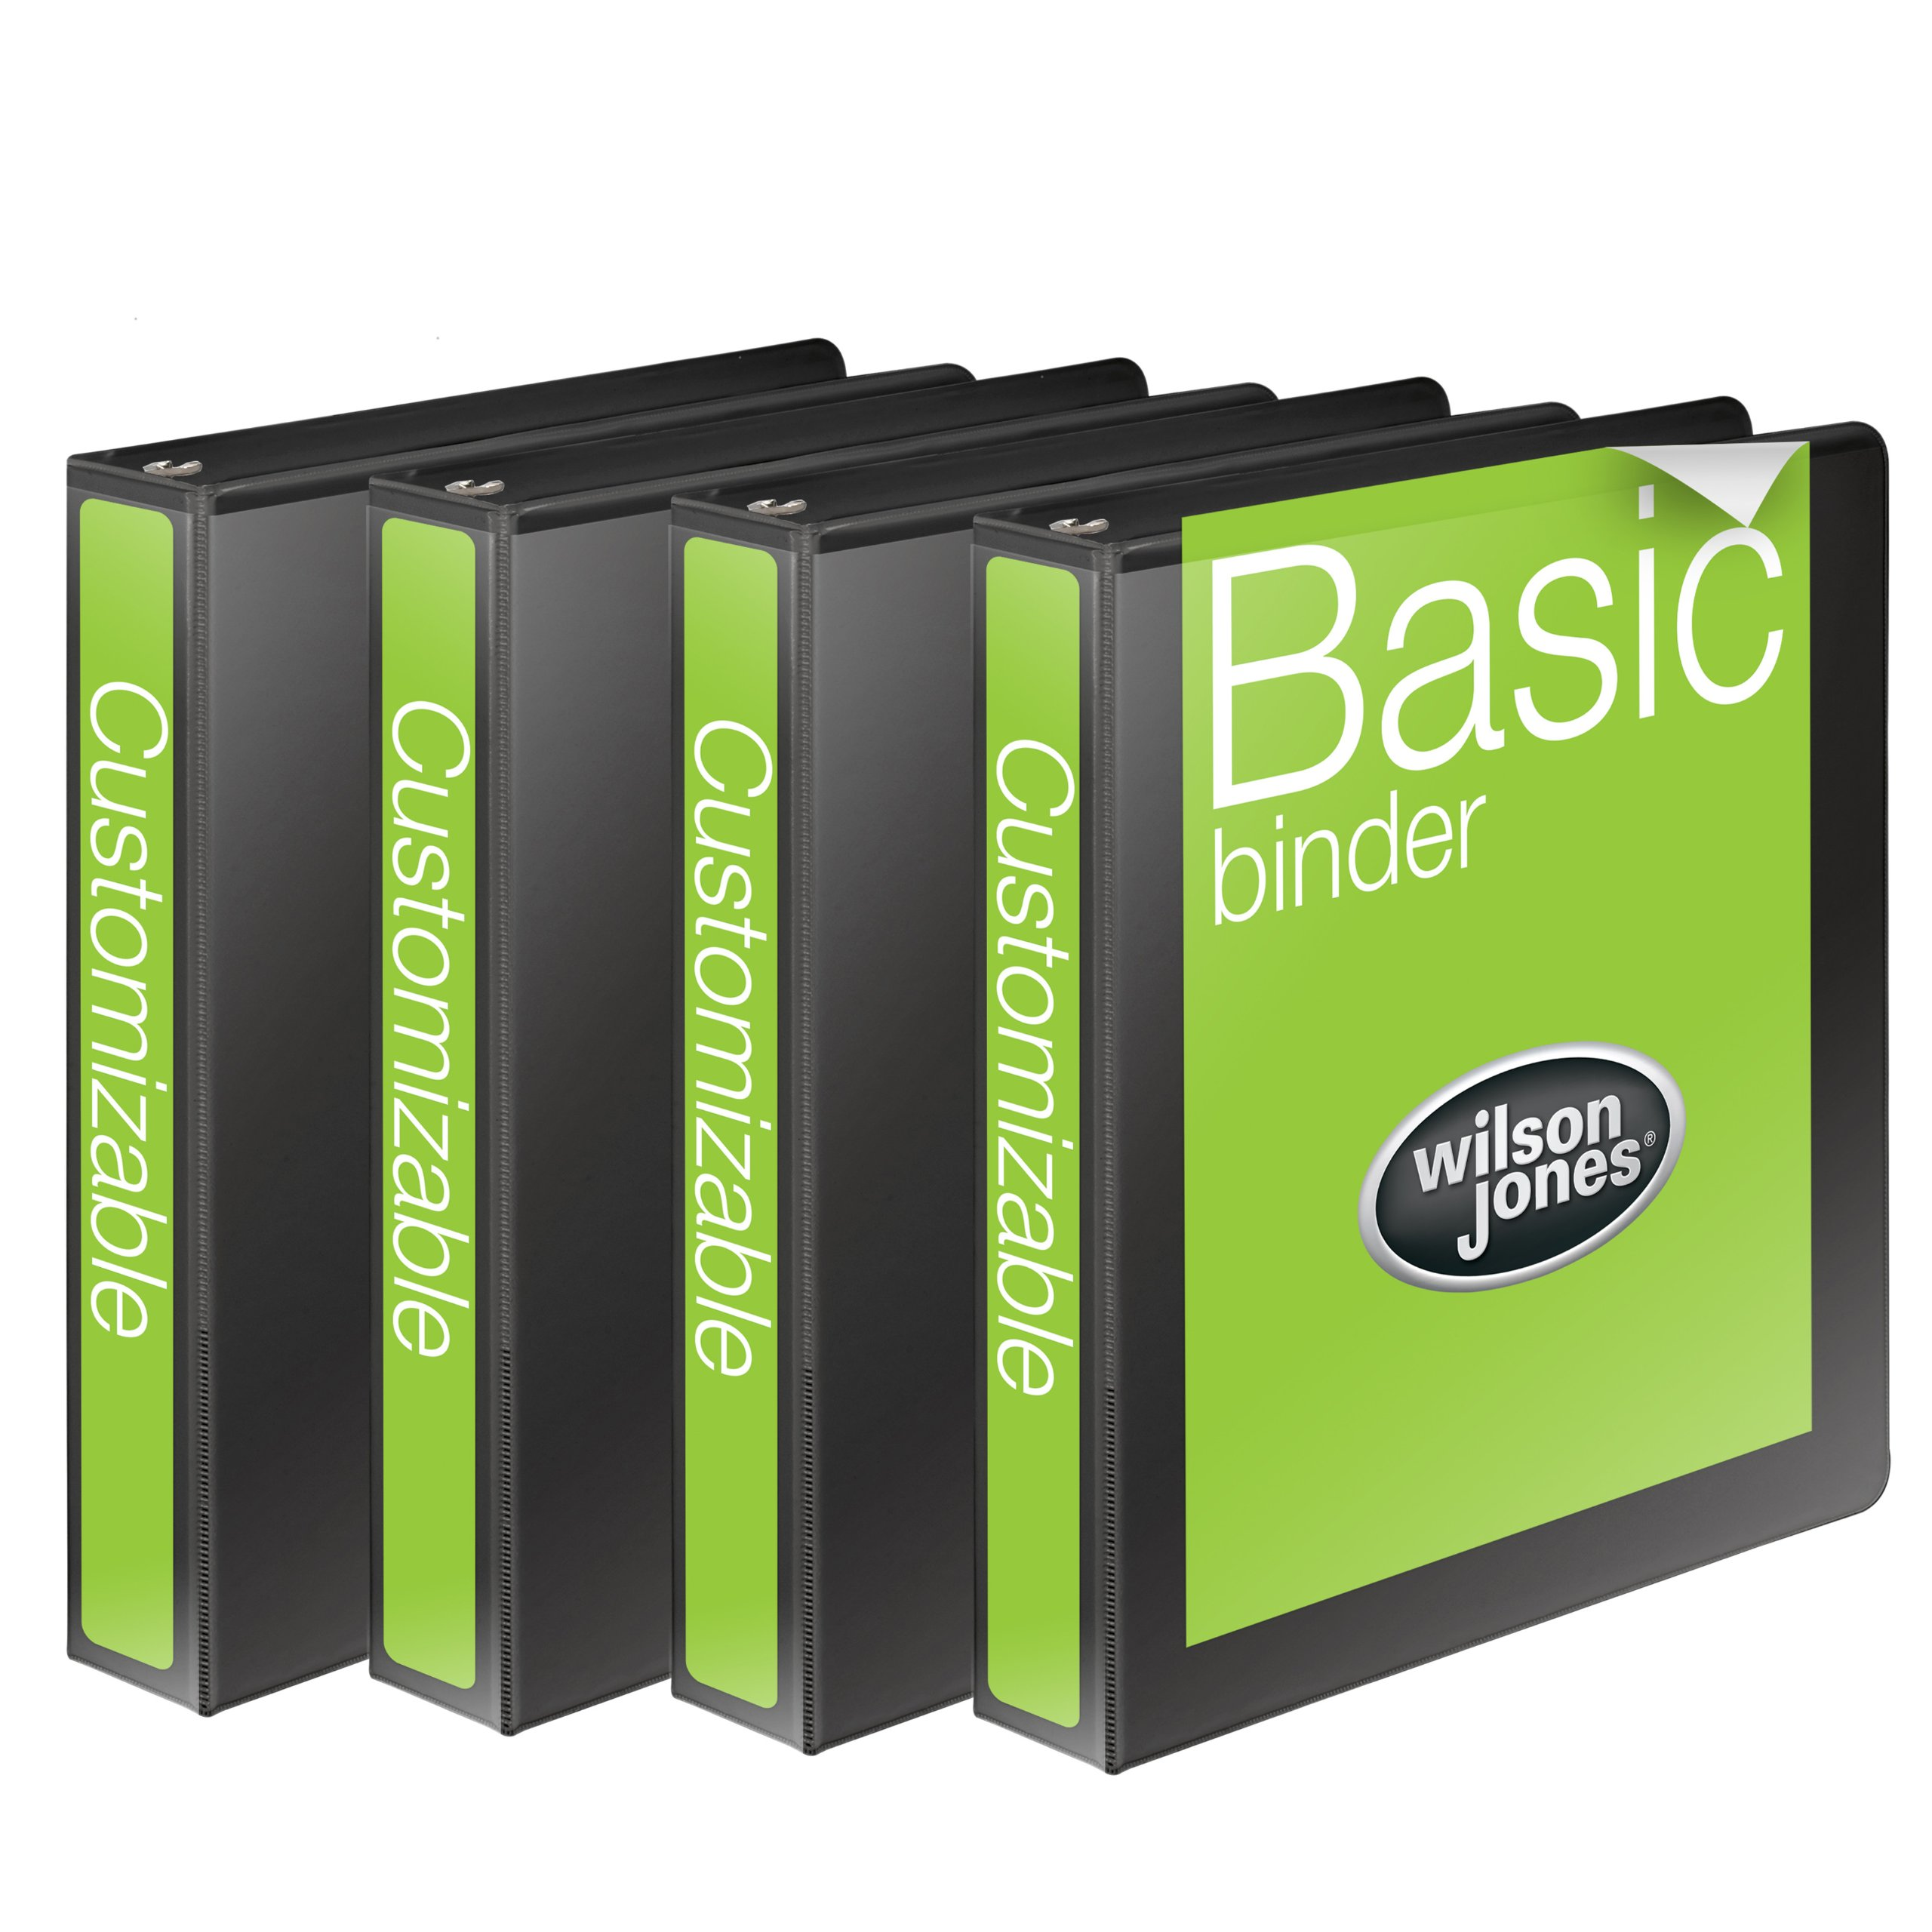 Wilson Jones 1 Inch 3 Ring Binder, Basic Round Ring View Binder, Black, 4 Pack (W70362-14BPP)